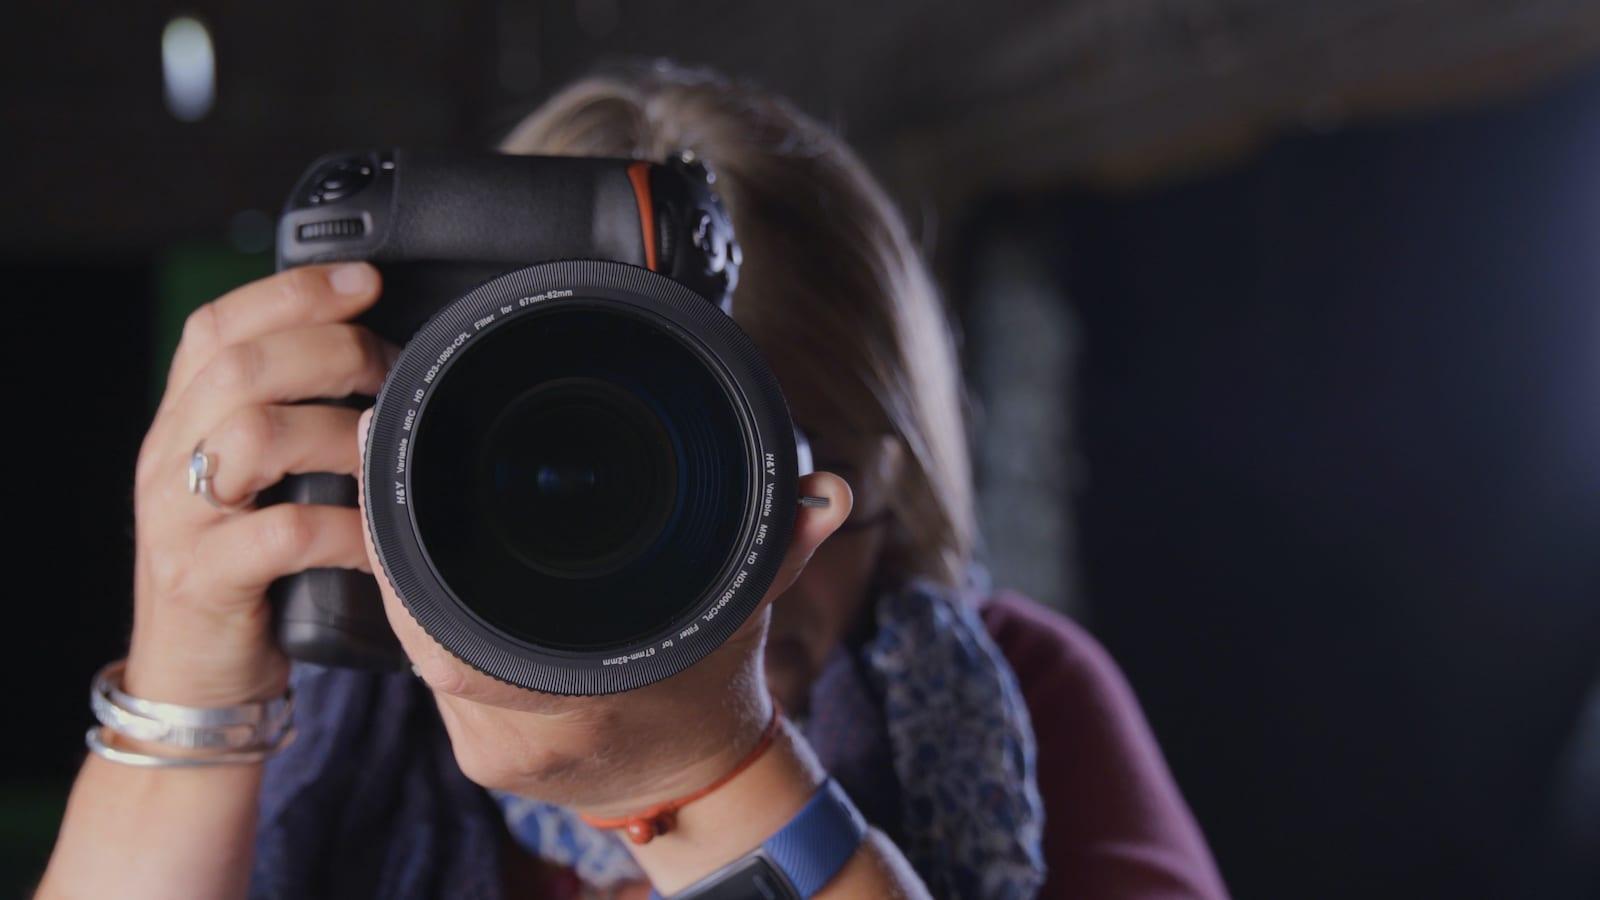 H&Y REVORING Variable ND+CPL Filter System lets you use a single filter on multiple camera lenses